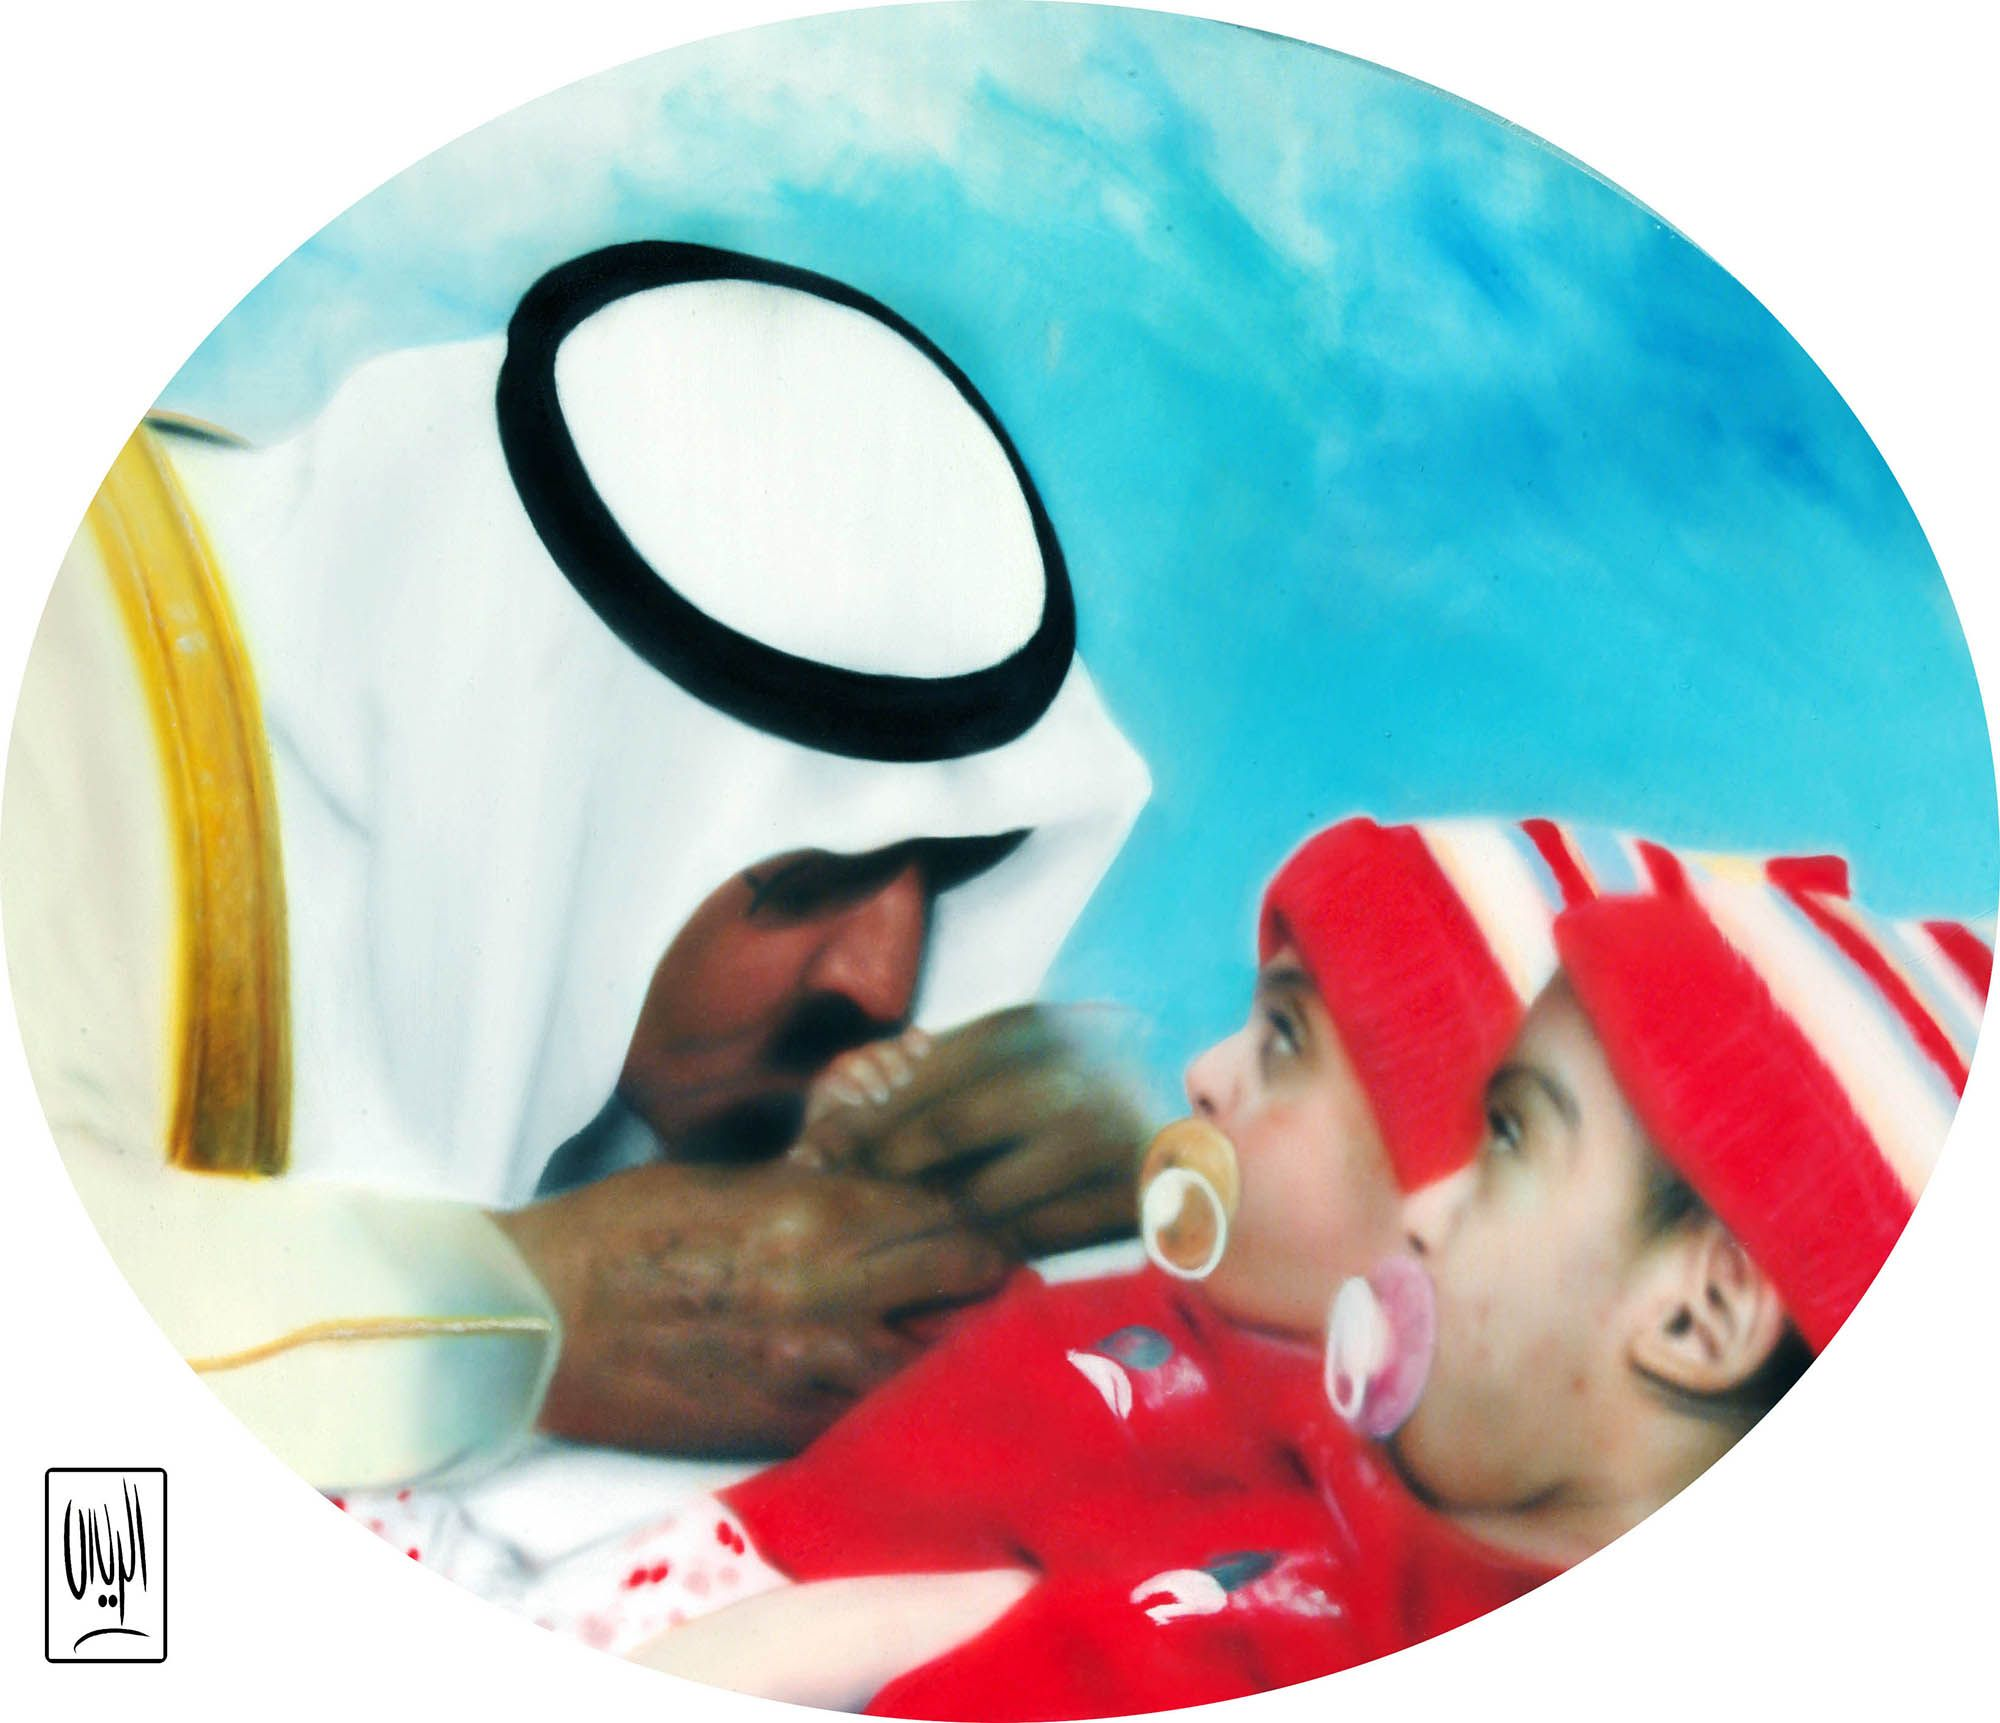 King Abdullah Oil Painting Cartoon Painting